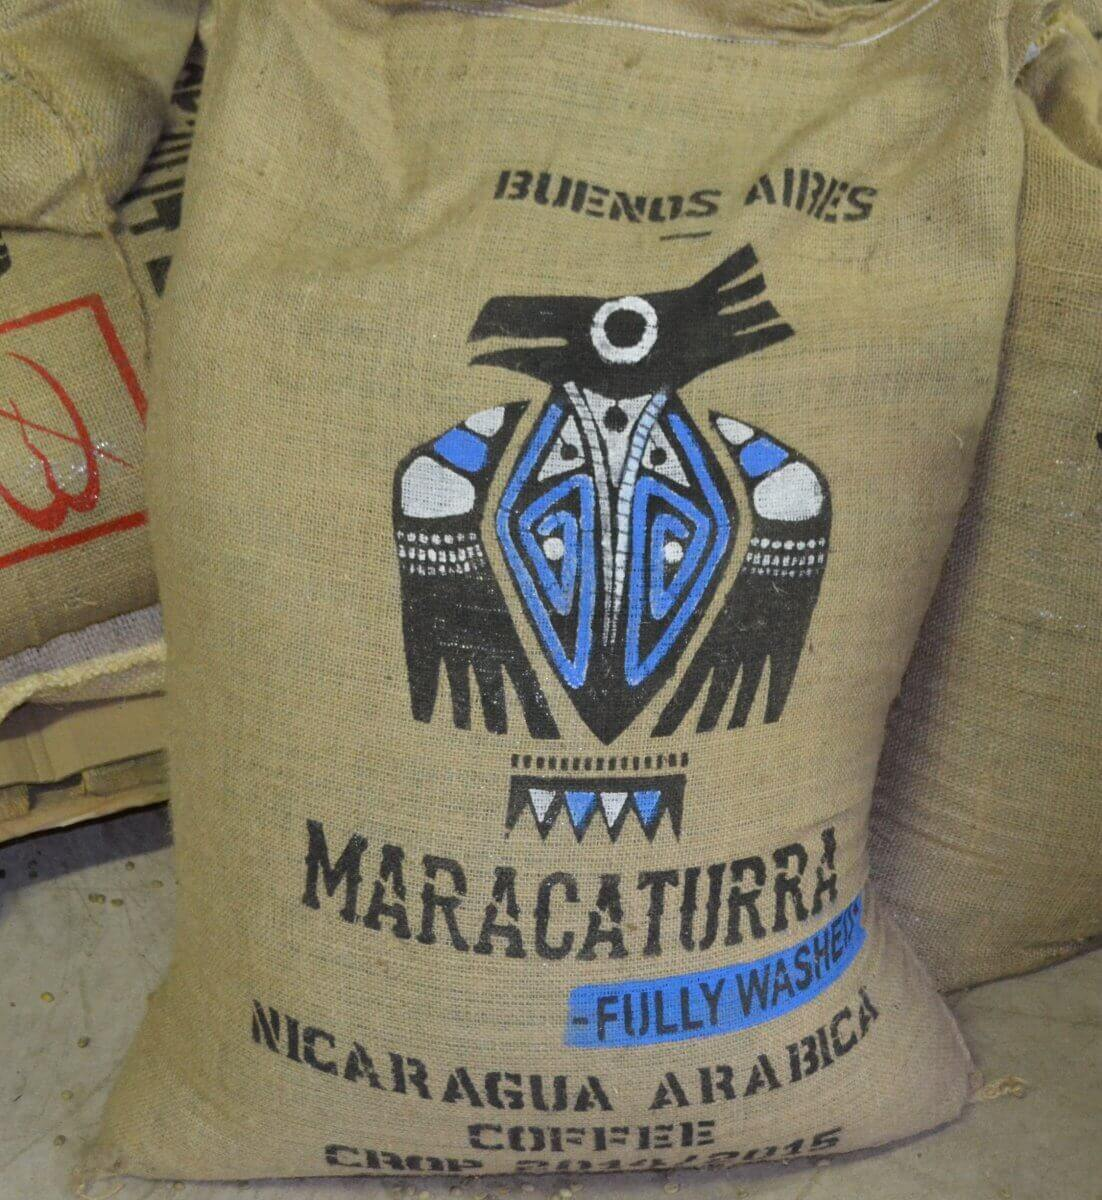 maracaturra dipilto nicaragua cafe terroir le sac